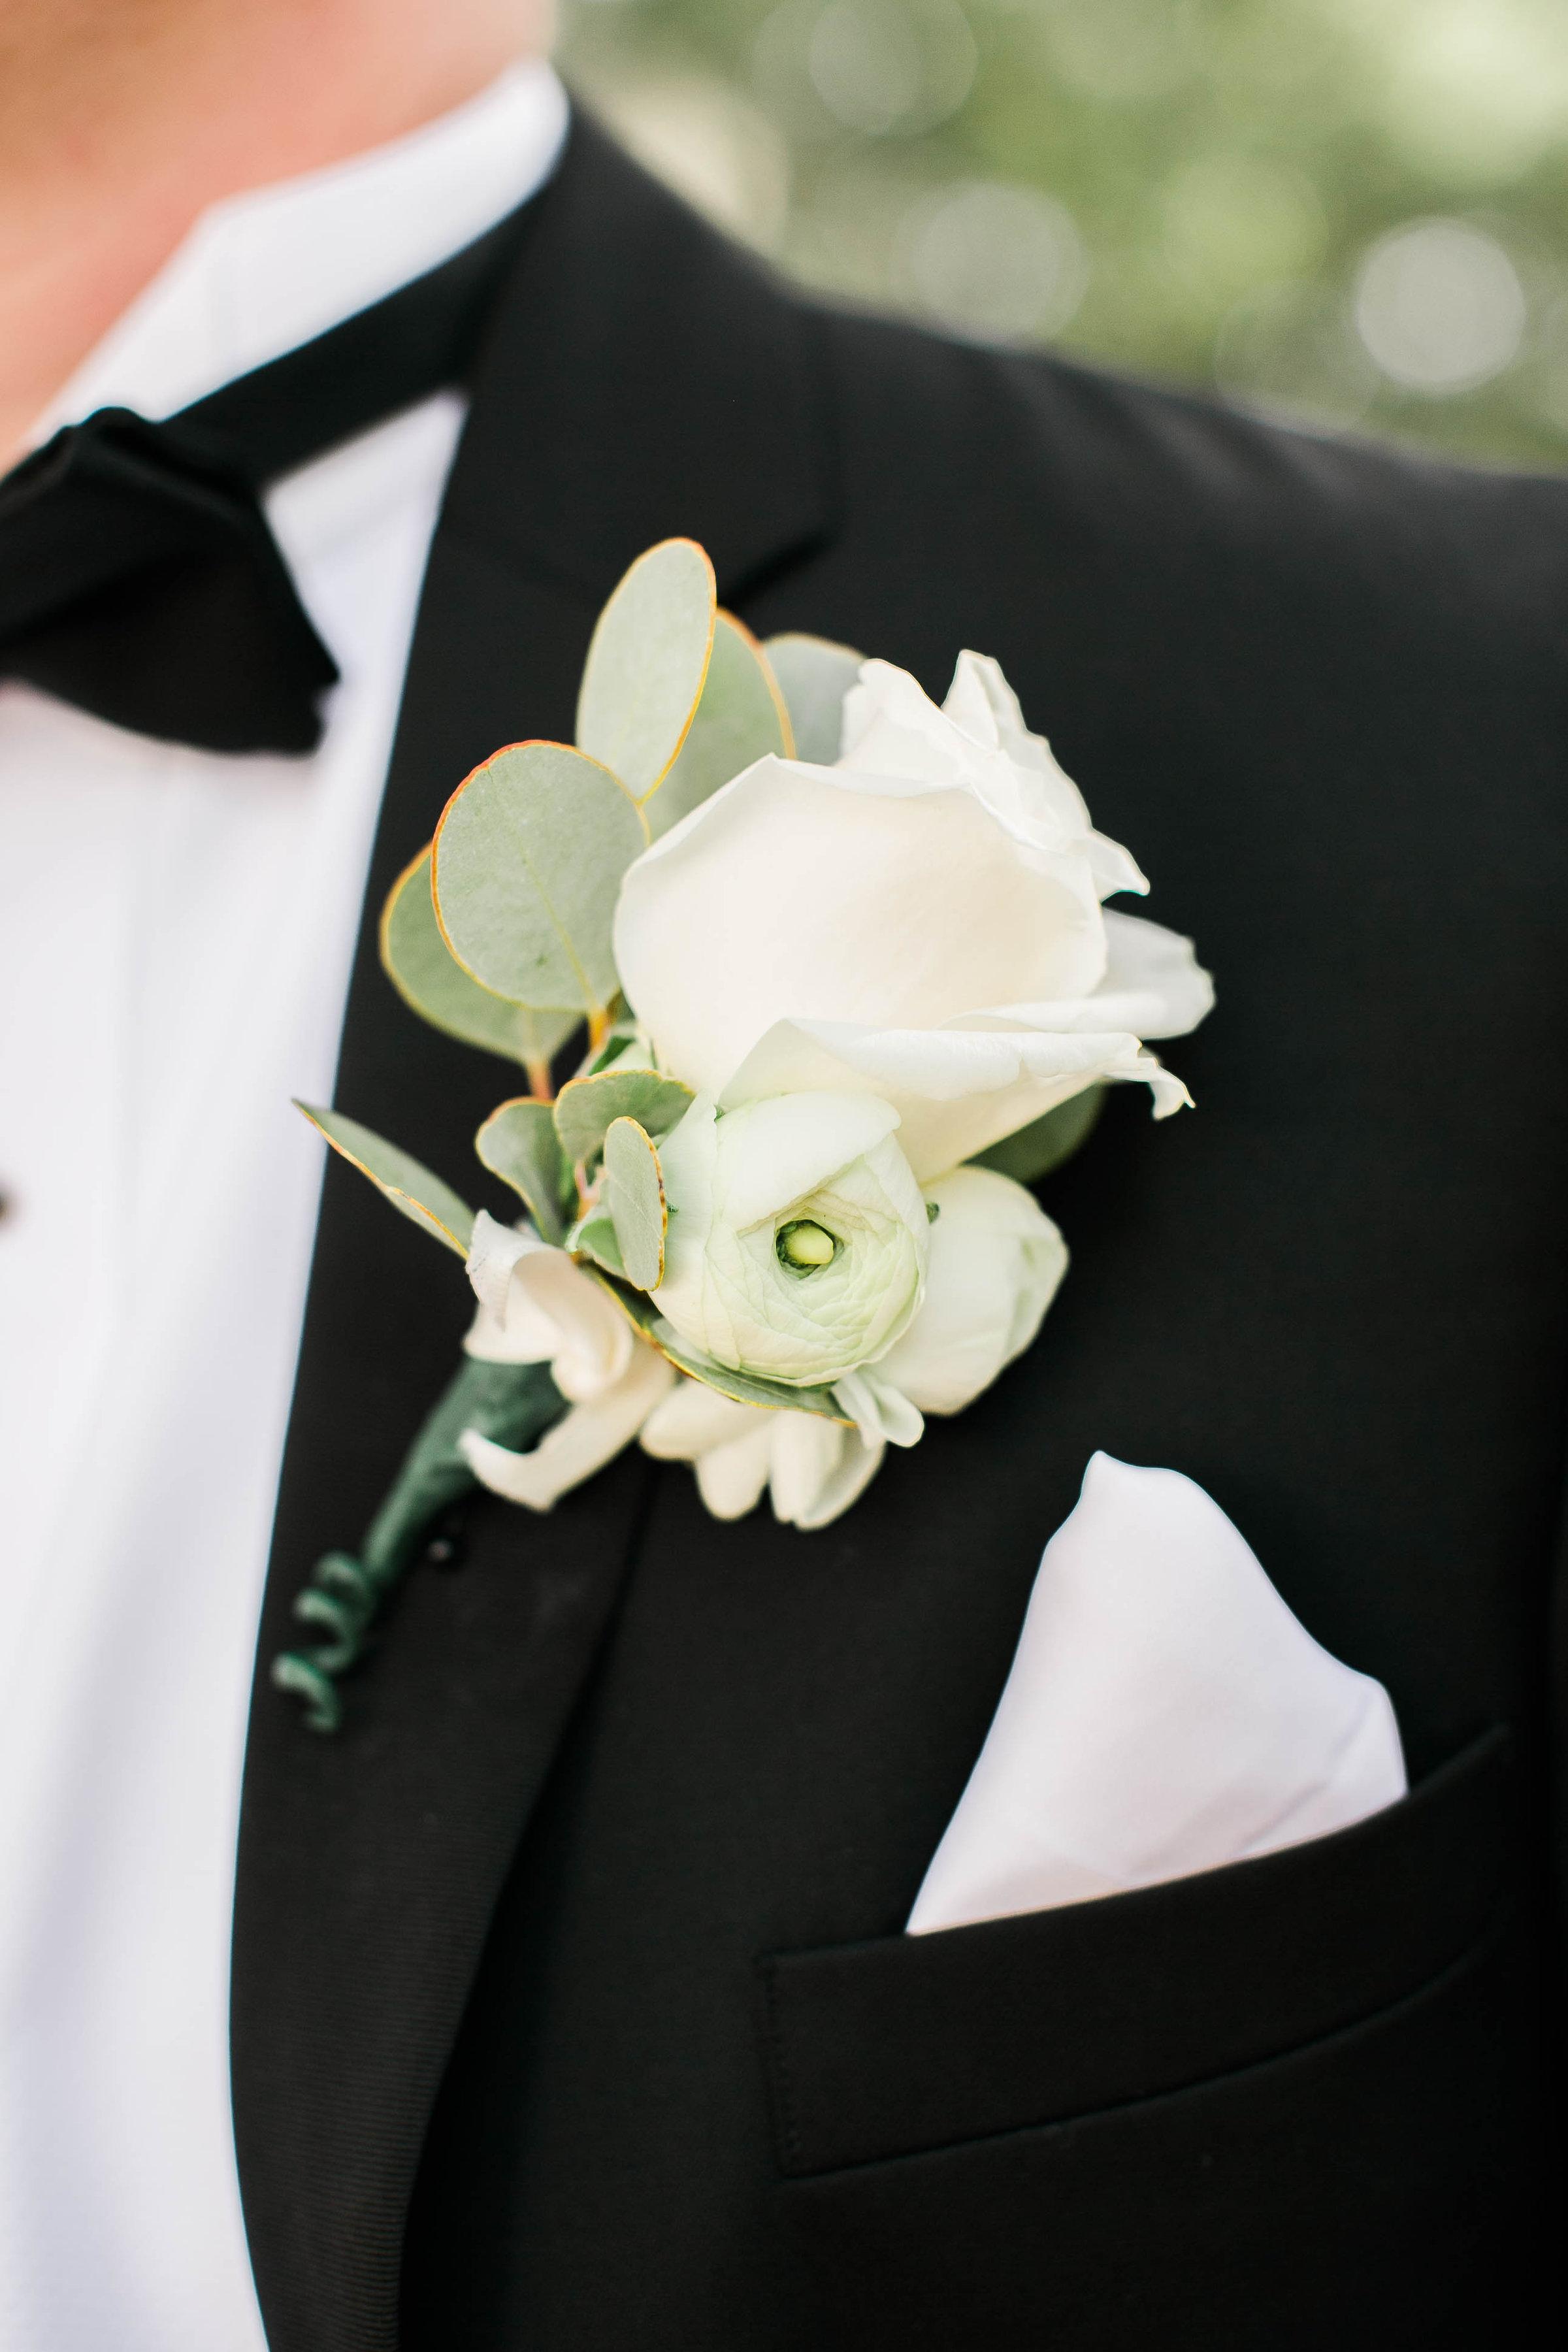 White rose boutonniere on a black tuxedo